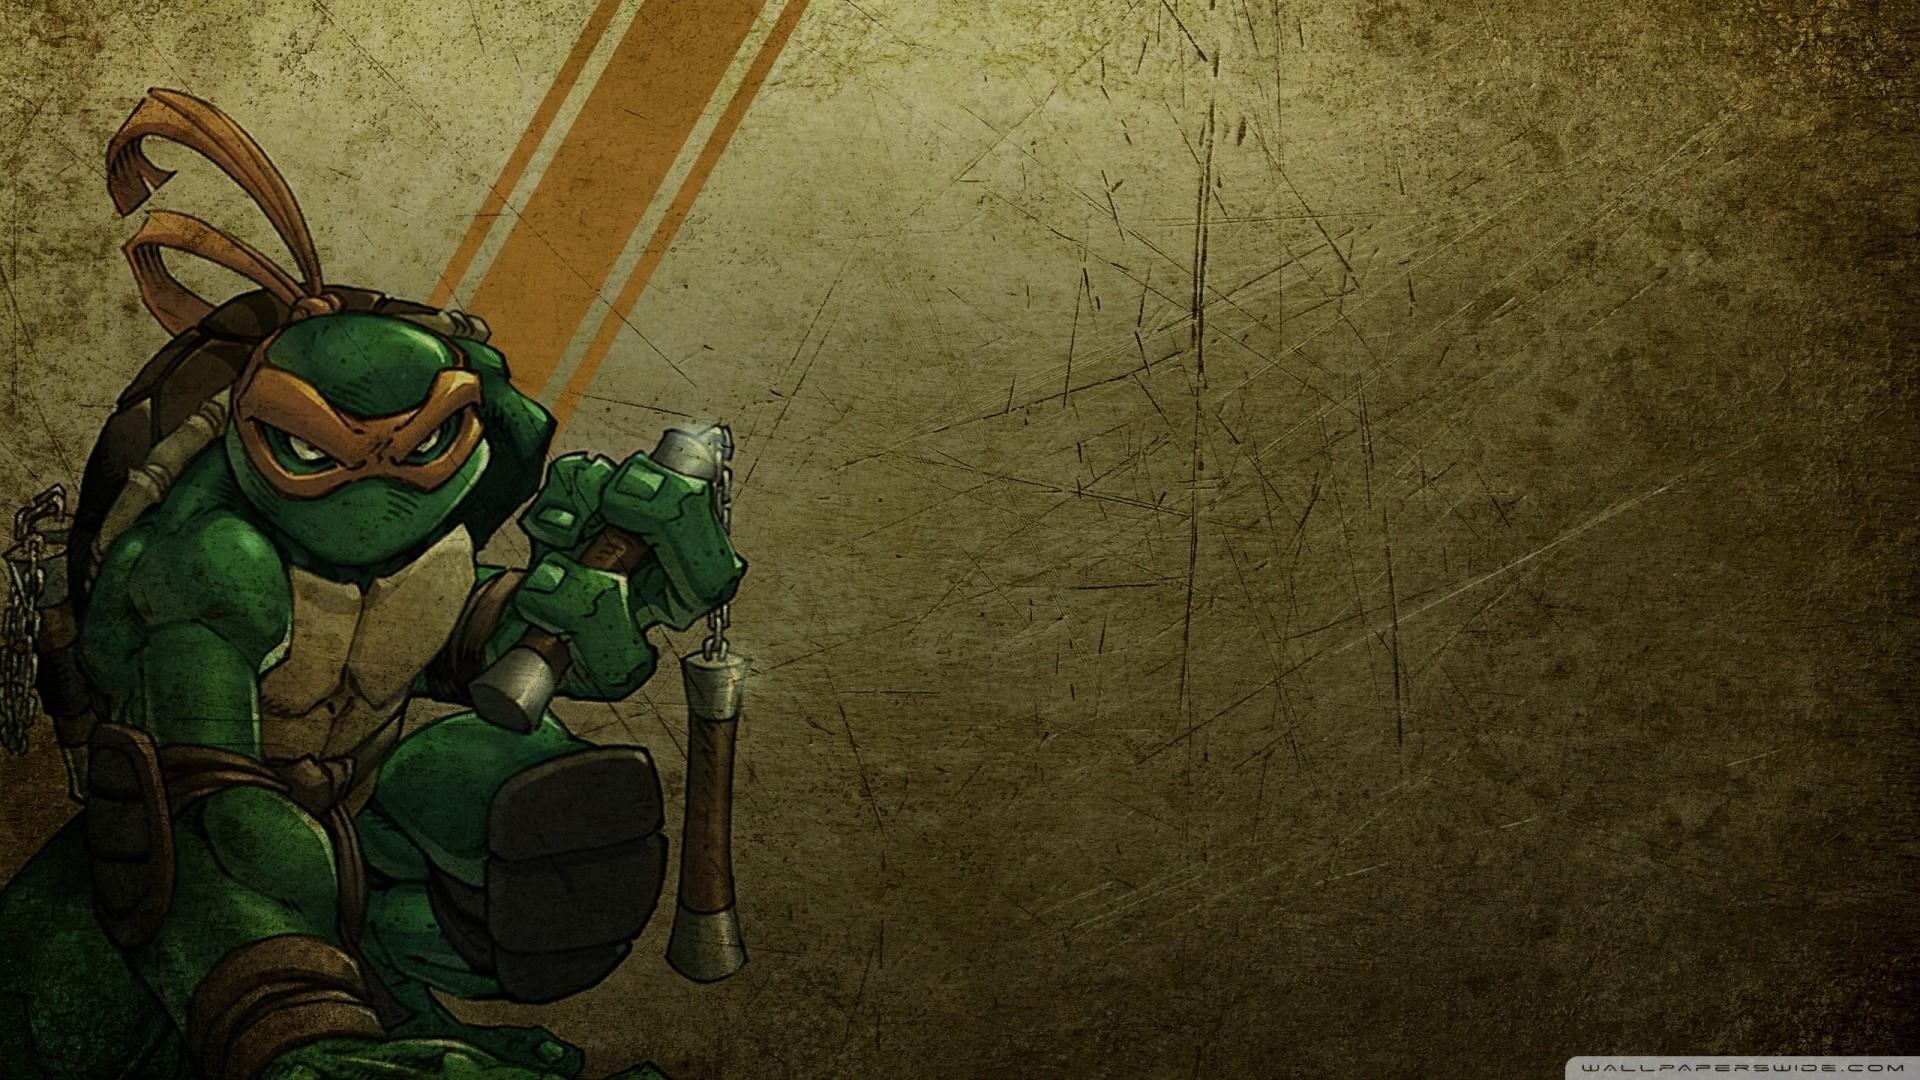 Teenage Mutant Ninja Turtles Wallpapers Wallpapertag